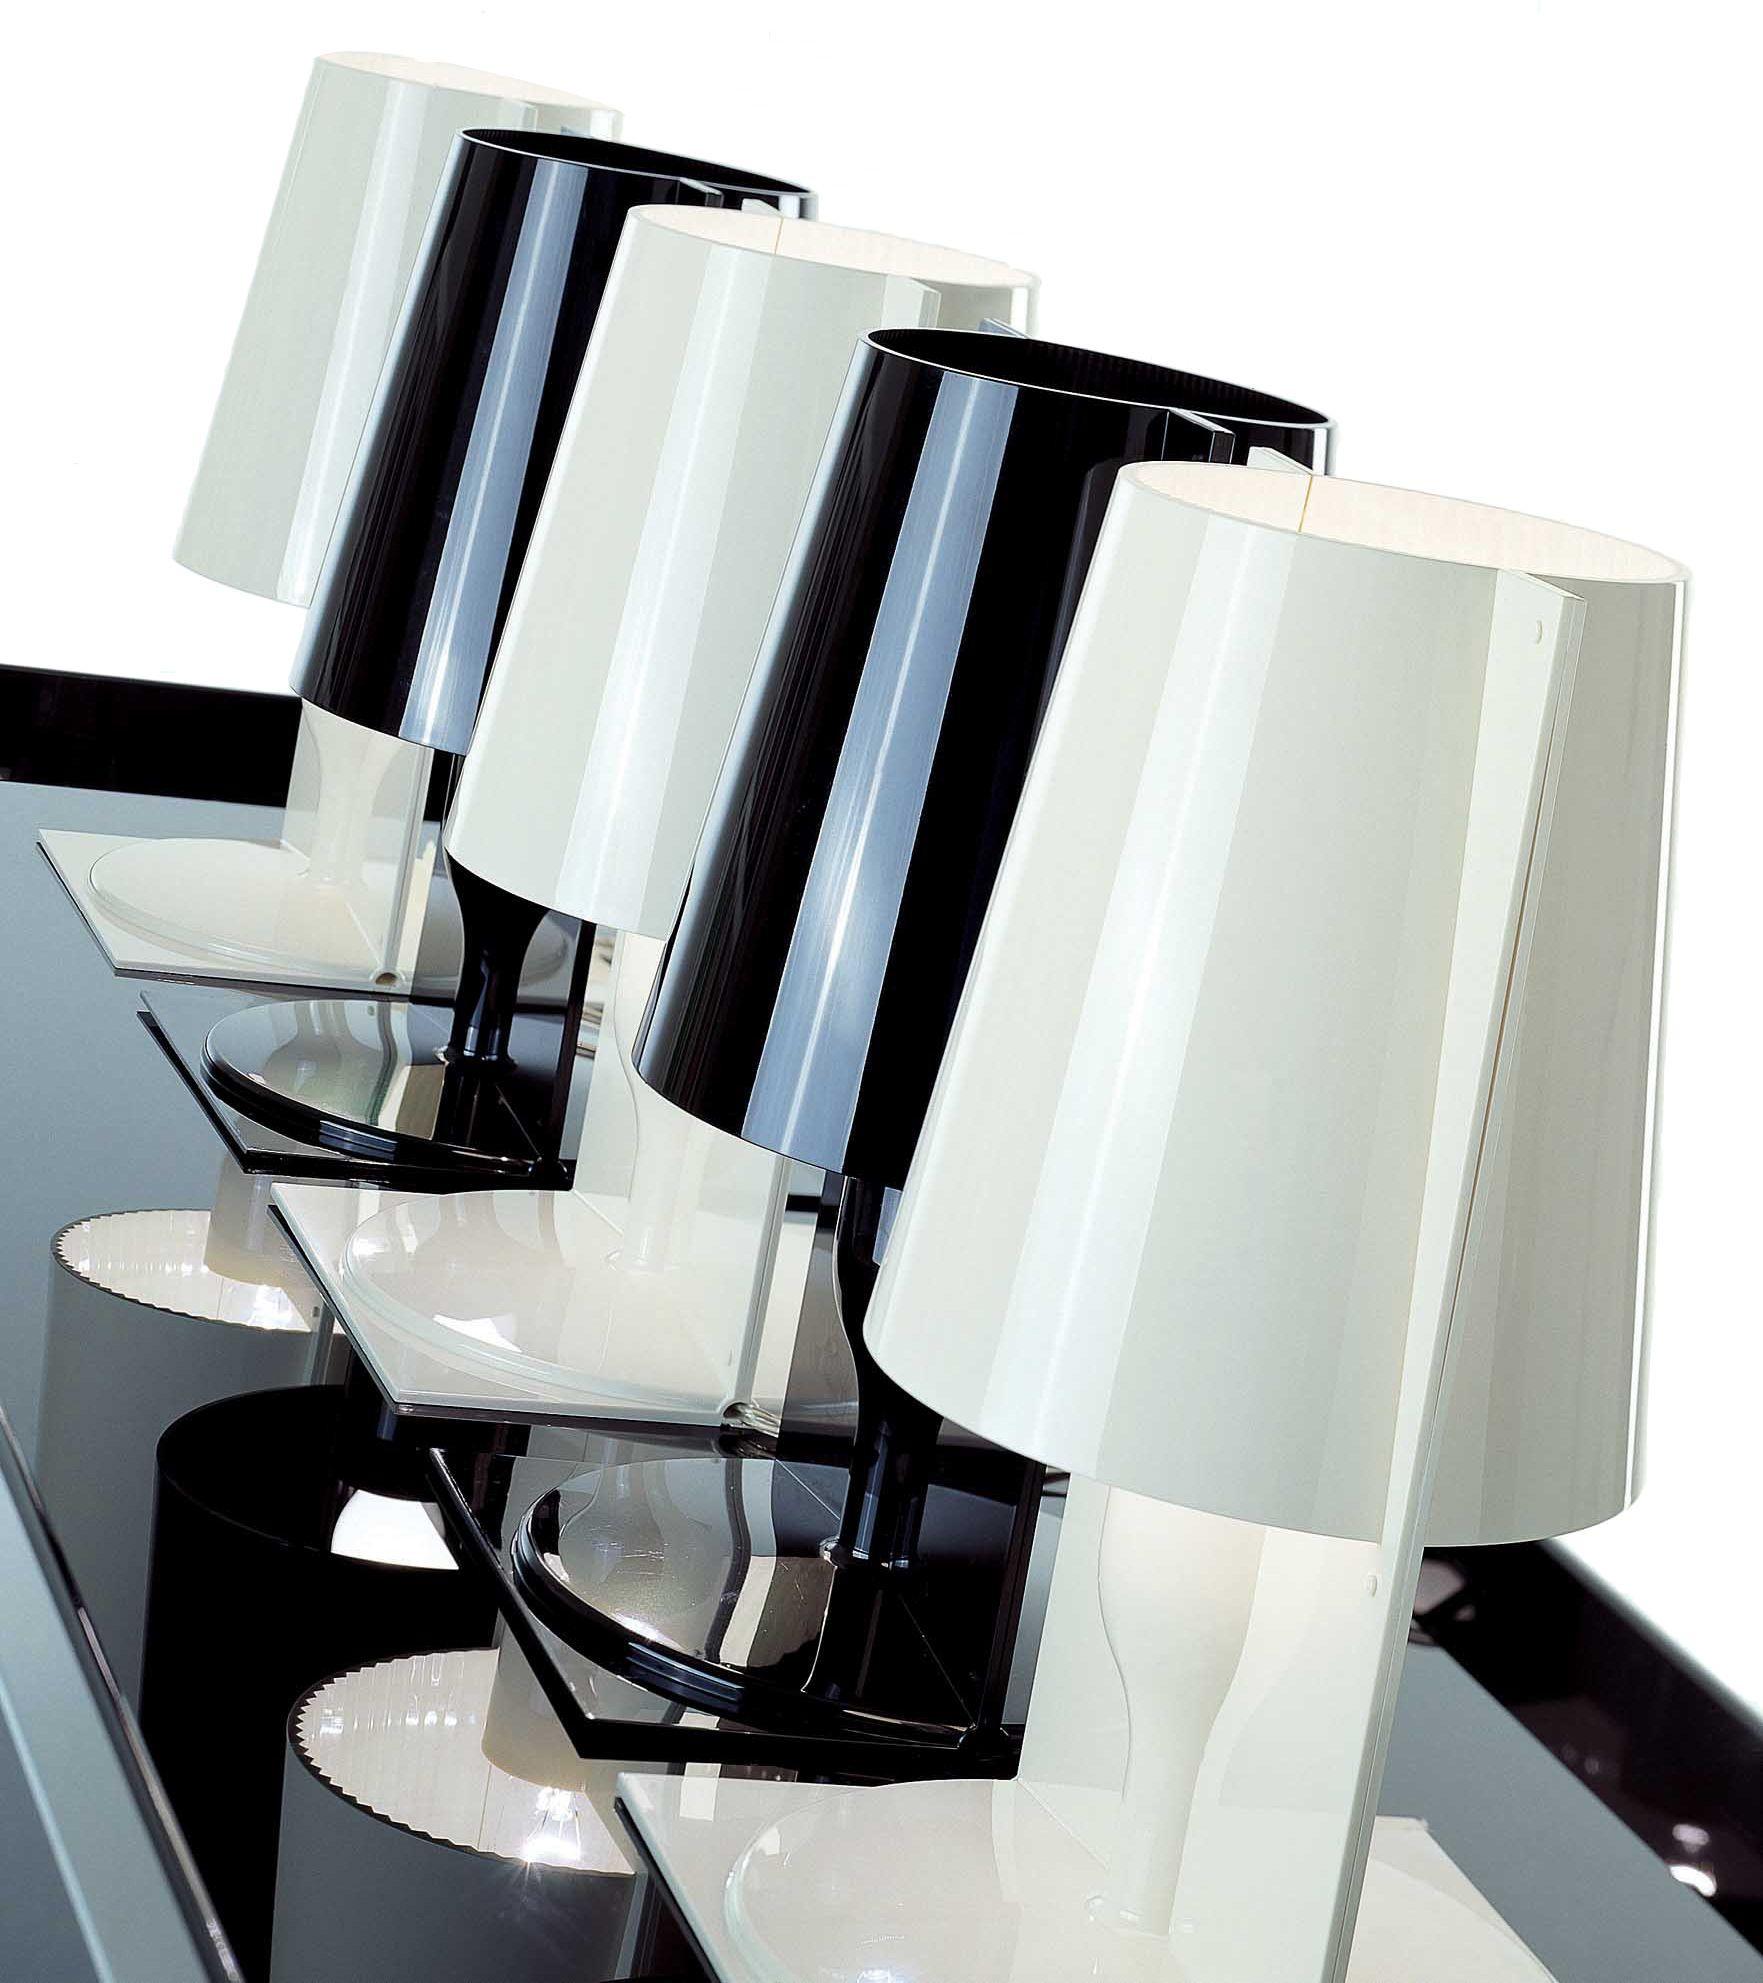 Lampe De Table Take Kartell Transparent Made In Design Lampe De Table Blanche Kartell Lampe